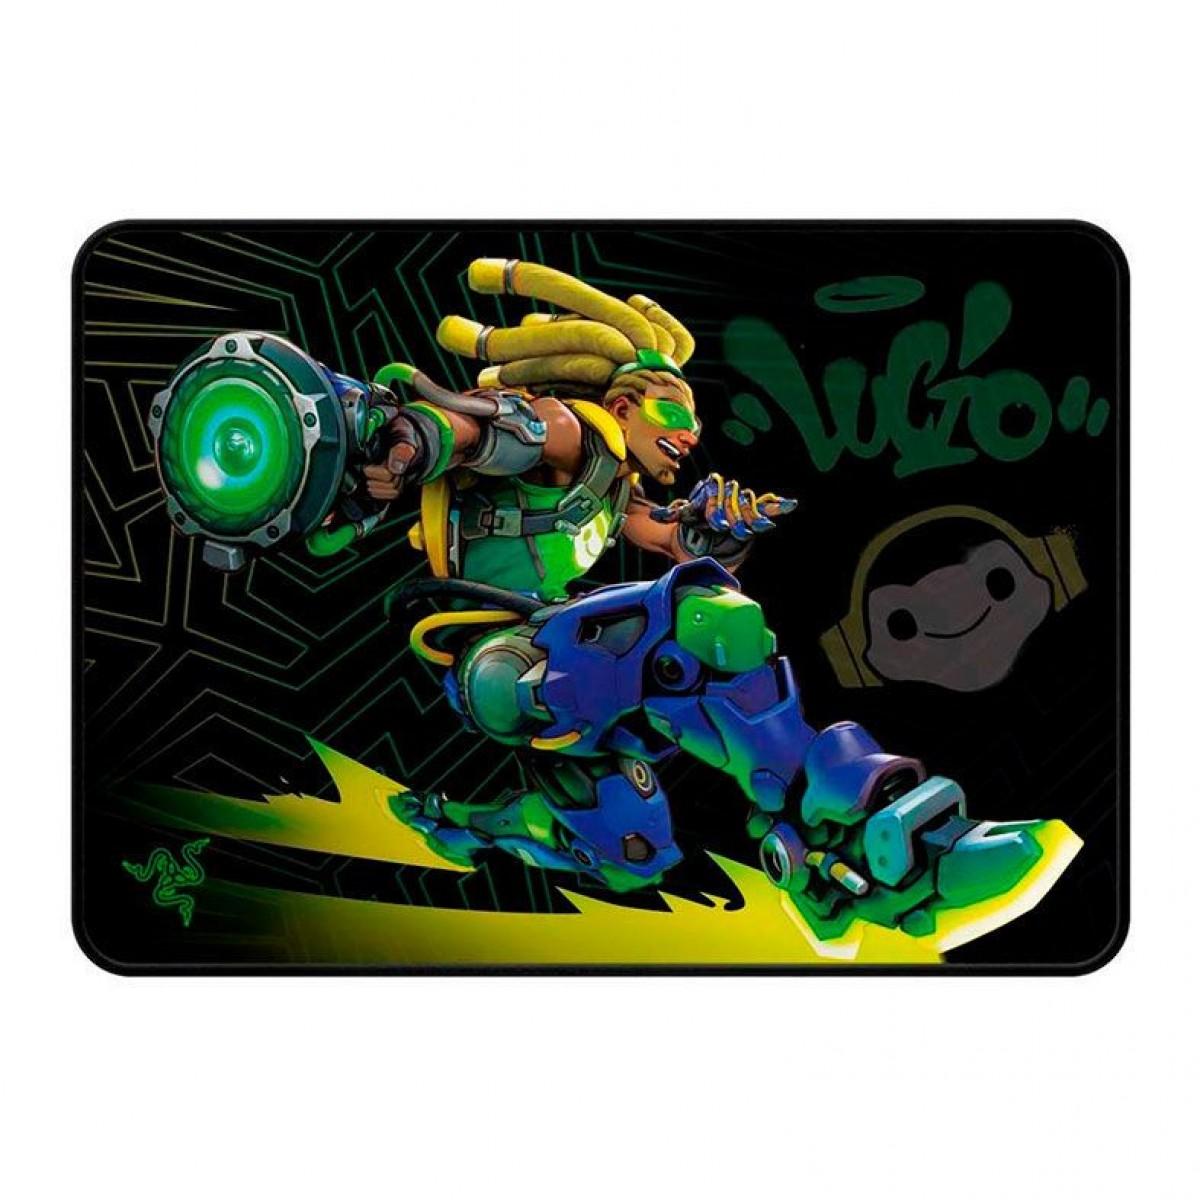 Mousepad Gamer Razer Goliathus Overwatch Lúcio Edition, Speed, Médio (355x254mm), RZ02-02930200-R3M1